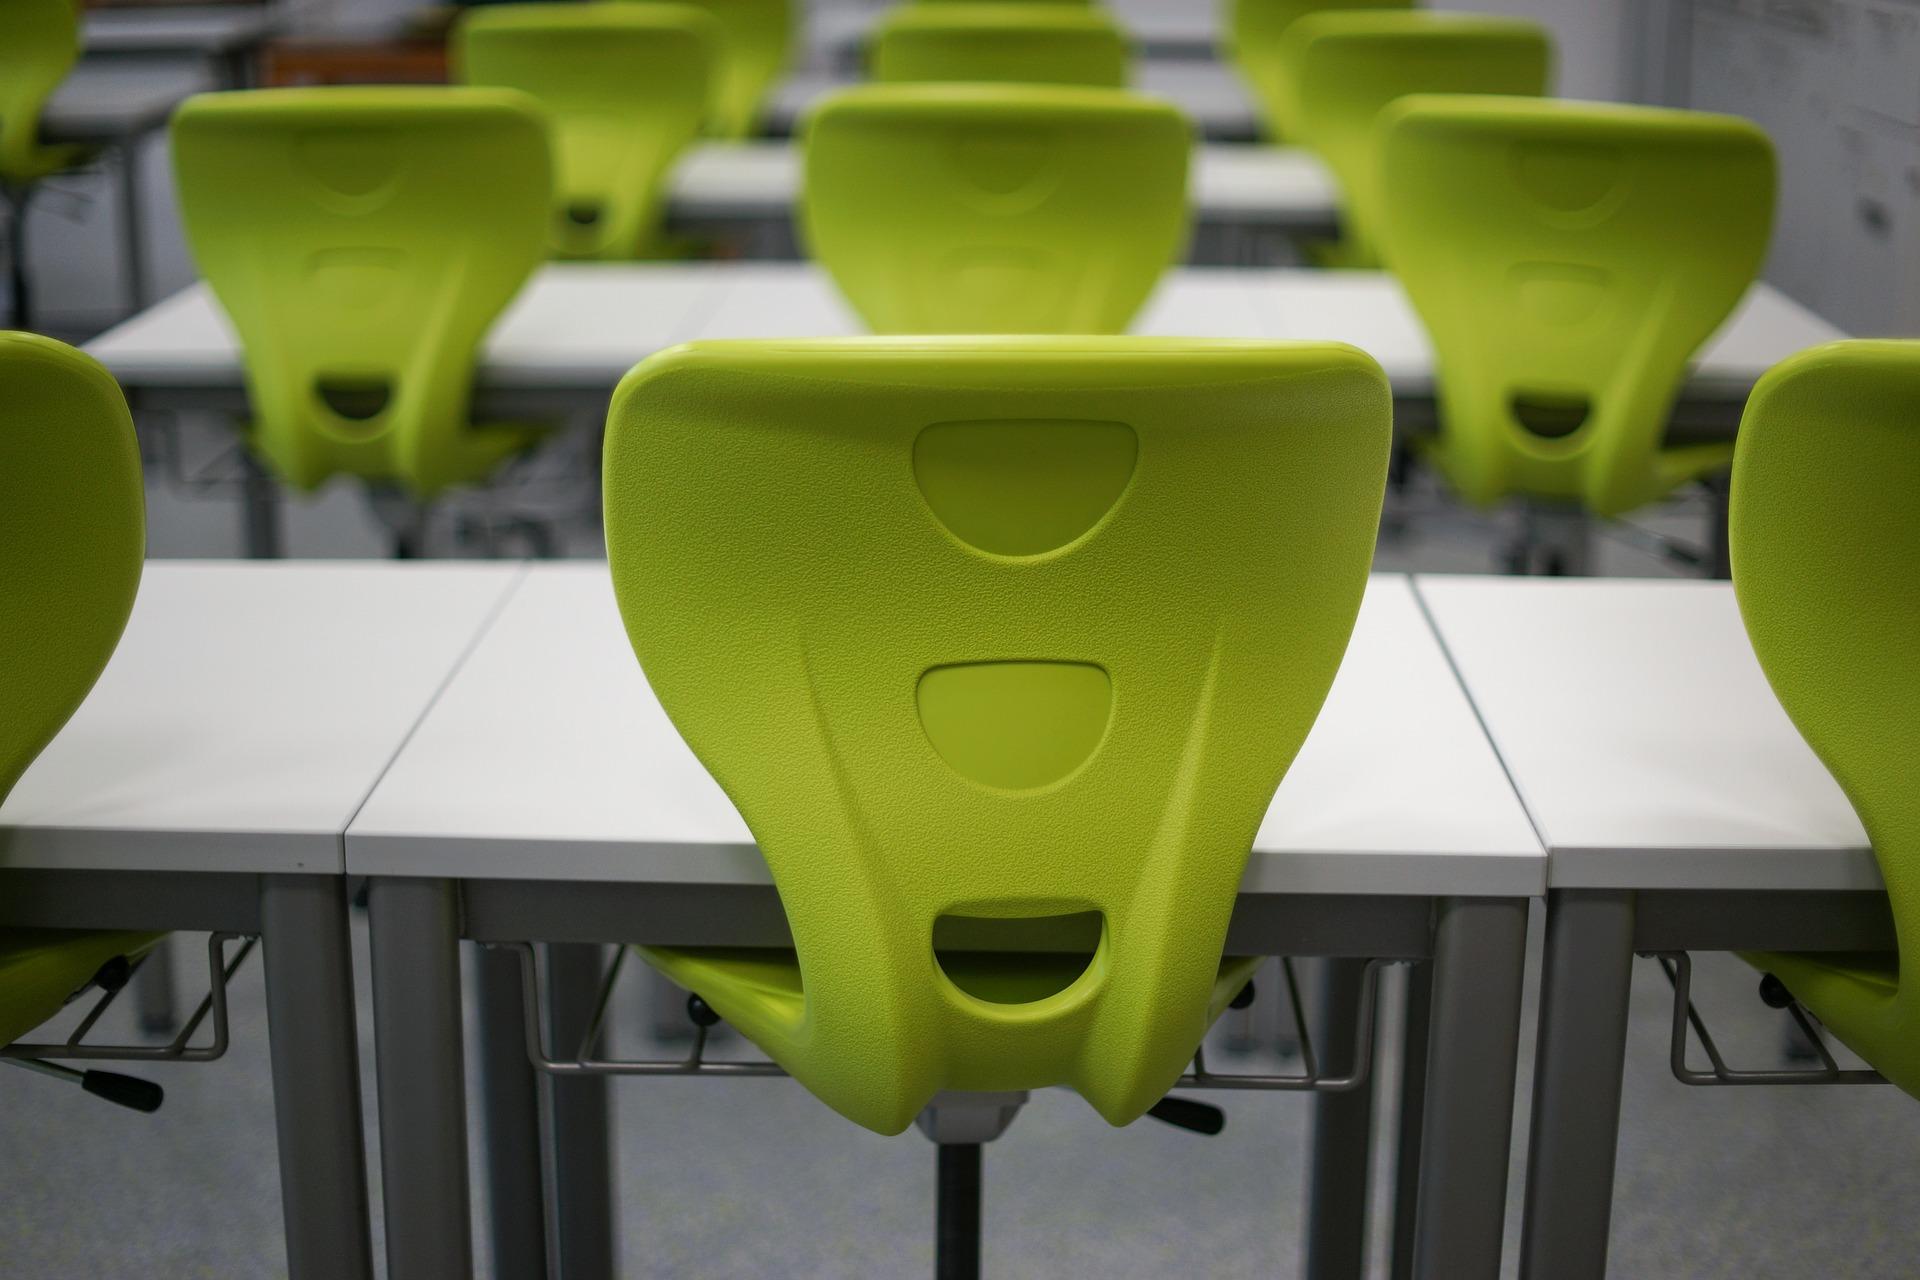 classroom-470680_1920